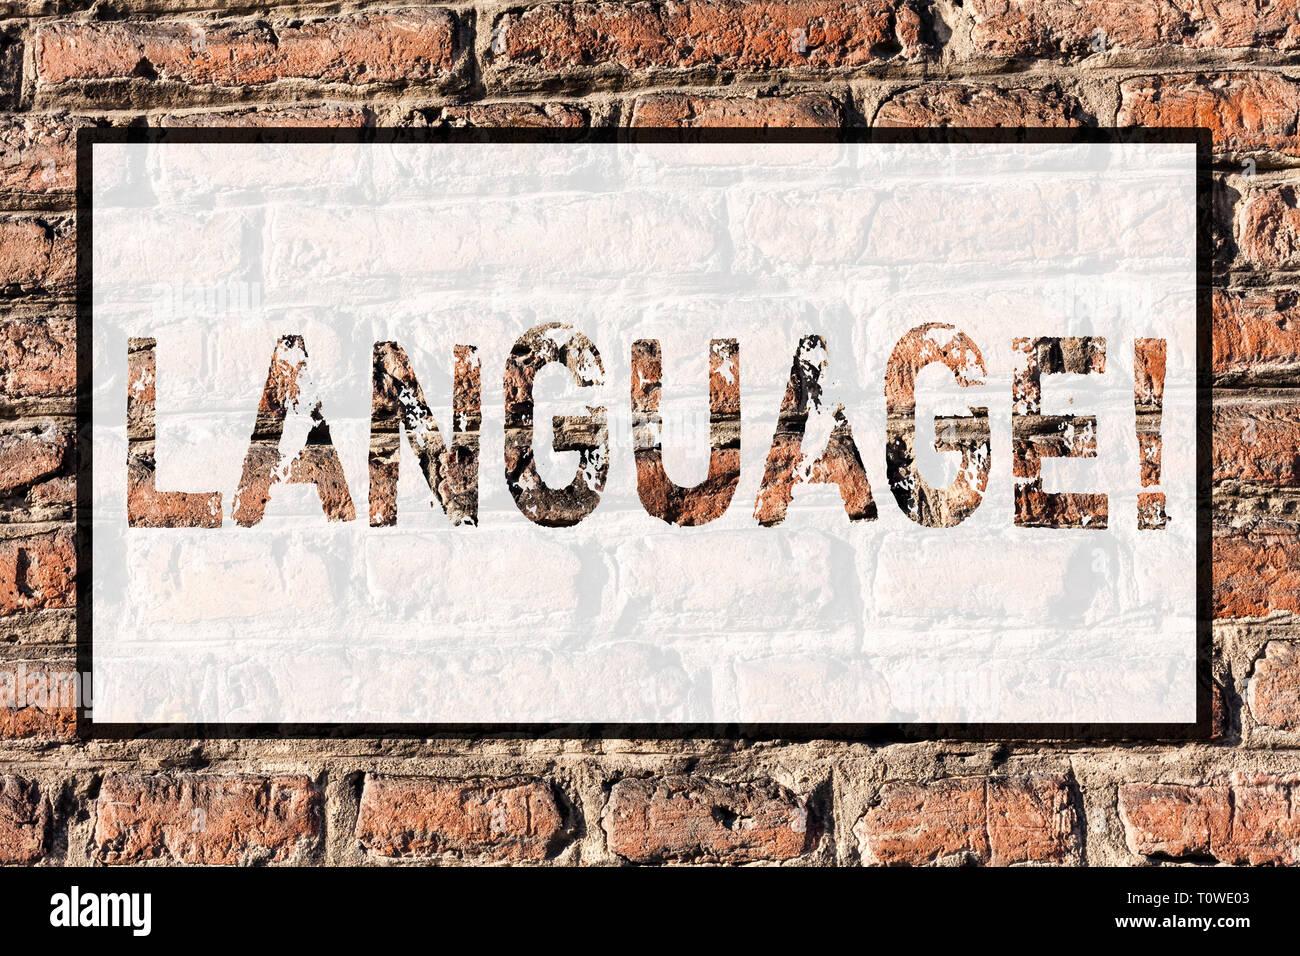 Word writing text Language. Business photo showcasing Method of huanalysis communication Spoken Written Use Words Expression Brick Wall art like Graff - Stock Image